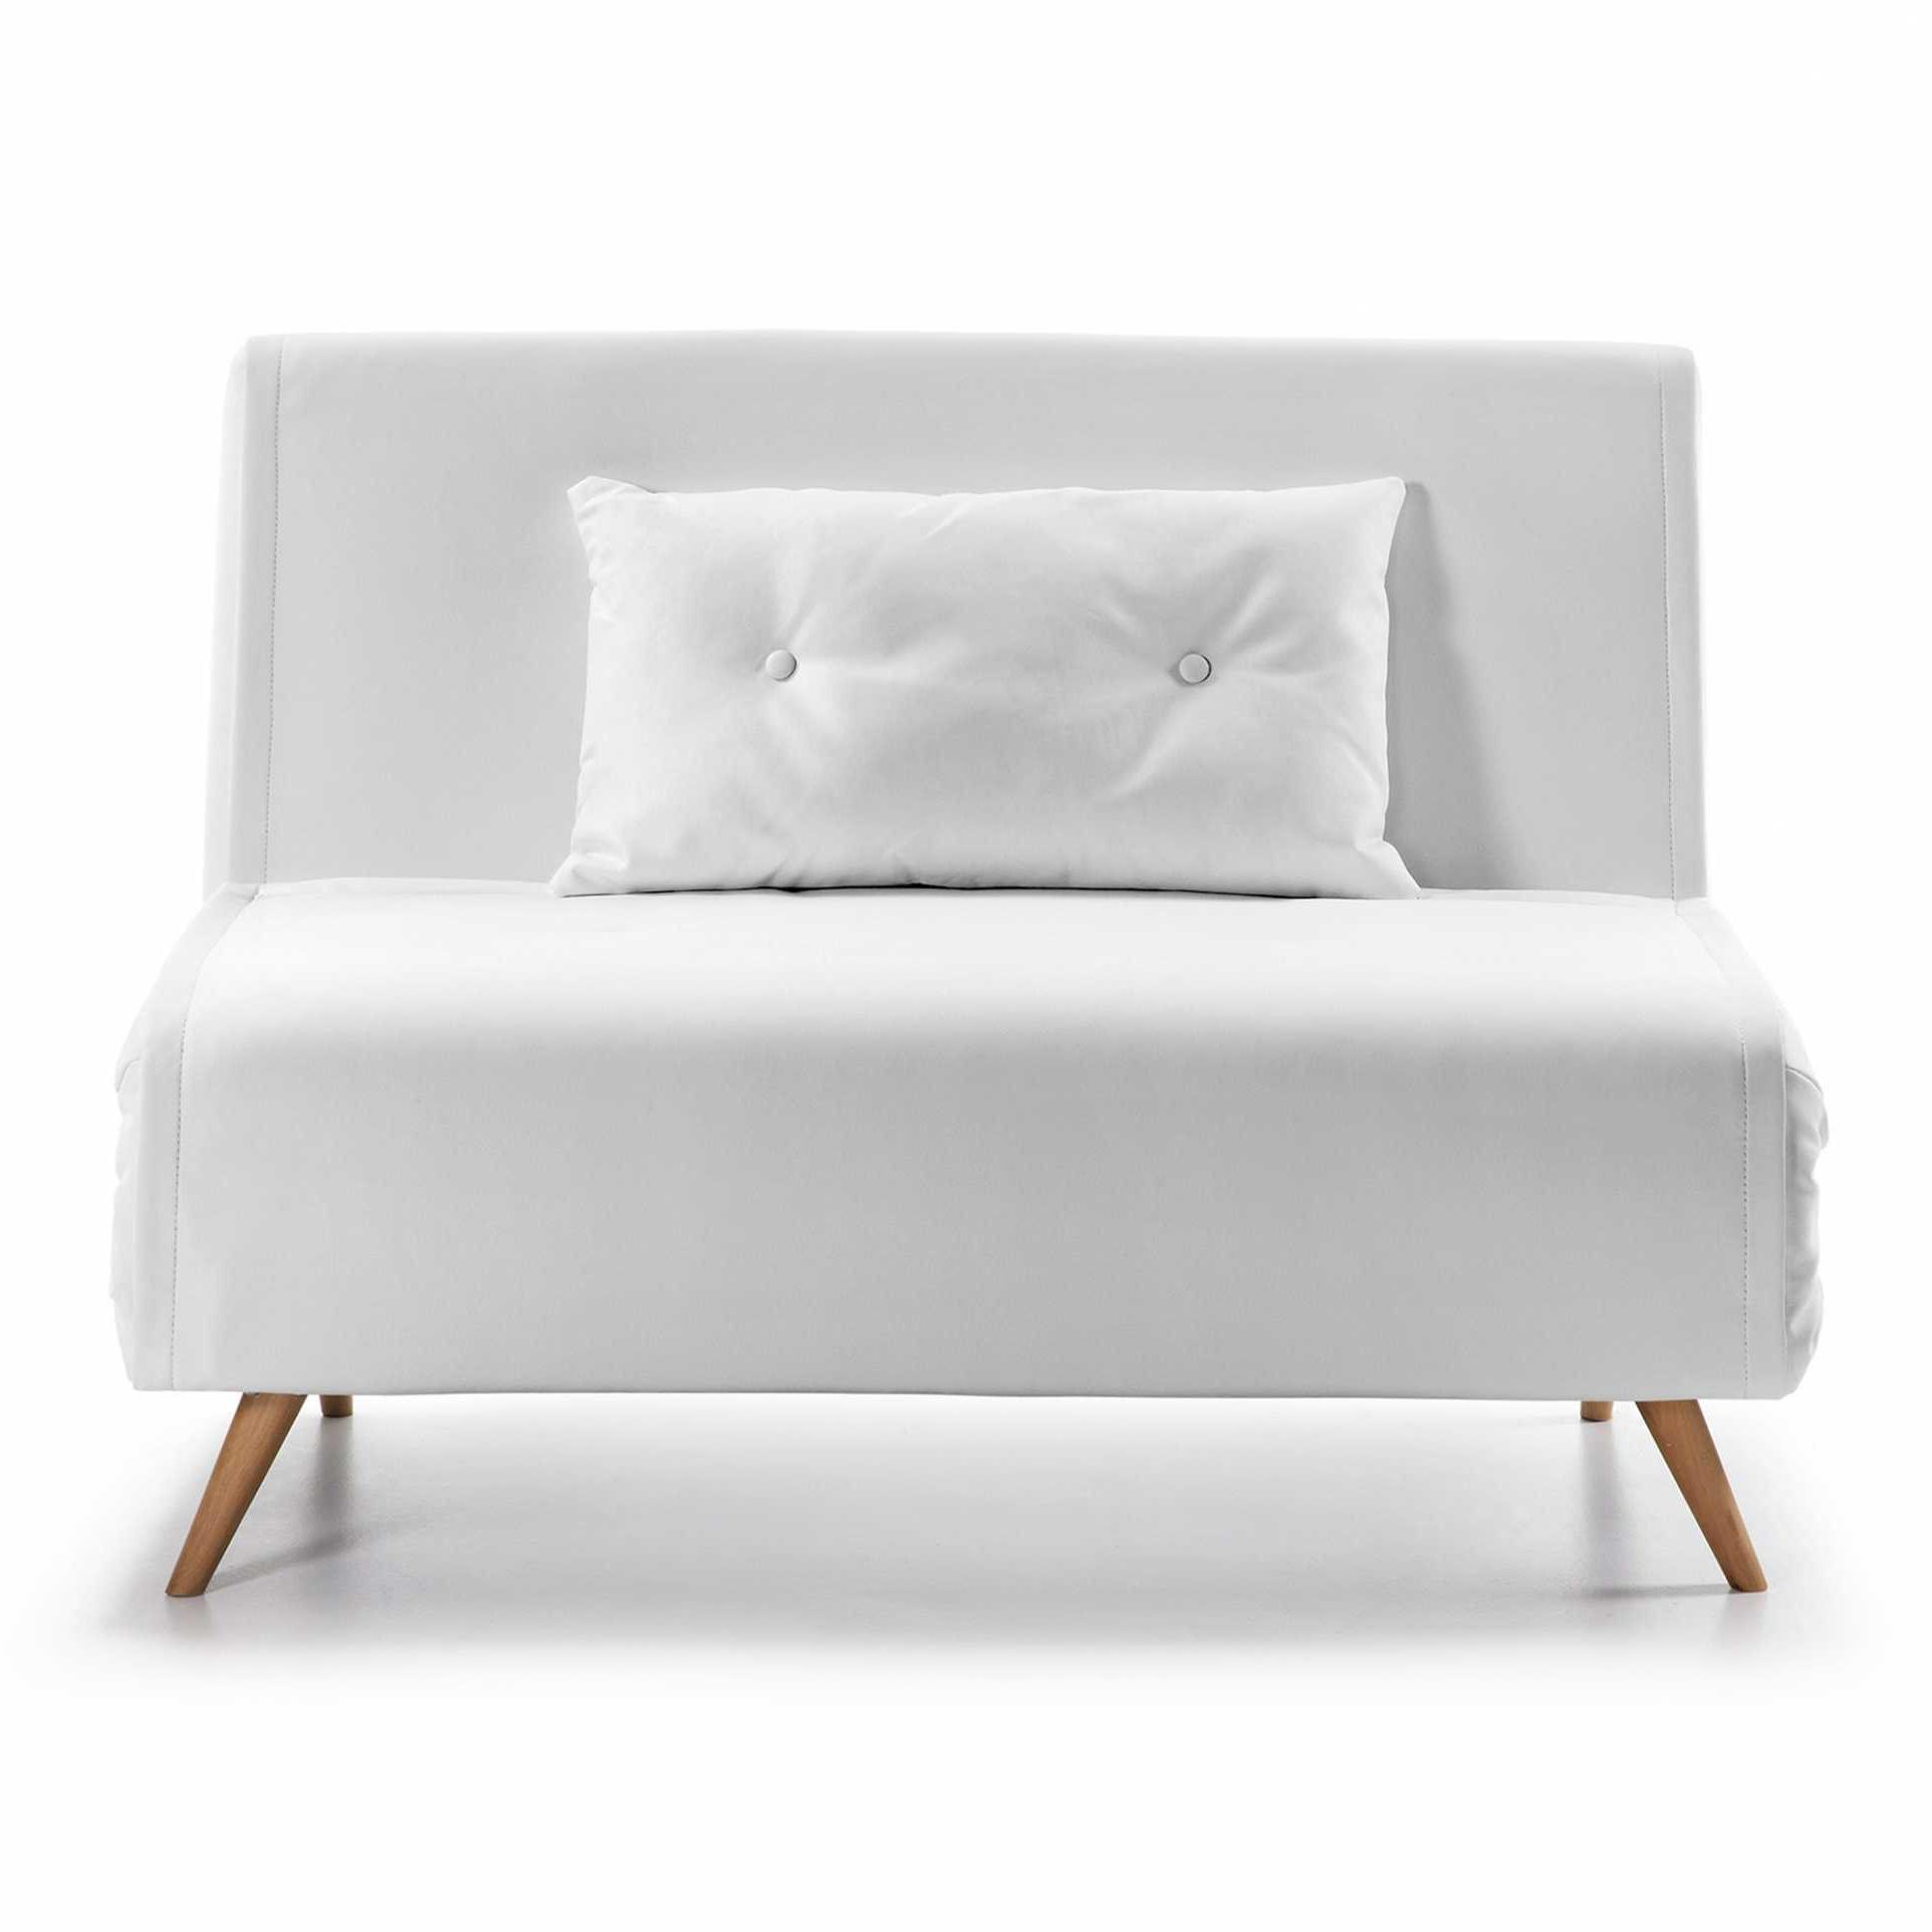 Sofa Cama Home Y7du sofà Cama Tupana Blanco Kave Home Shanerucopy